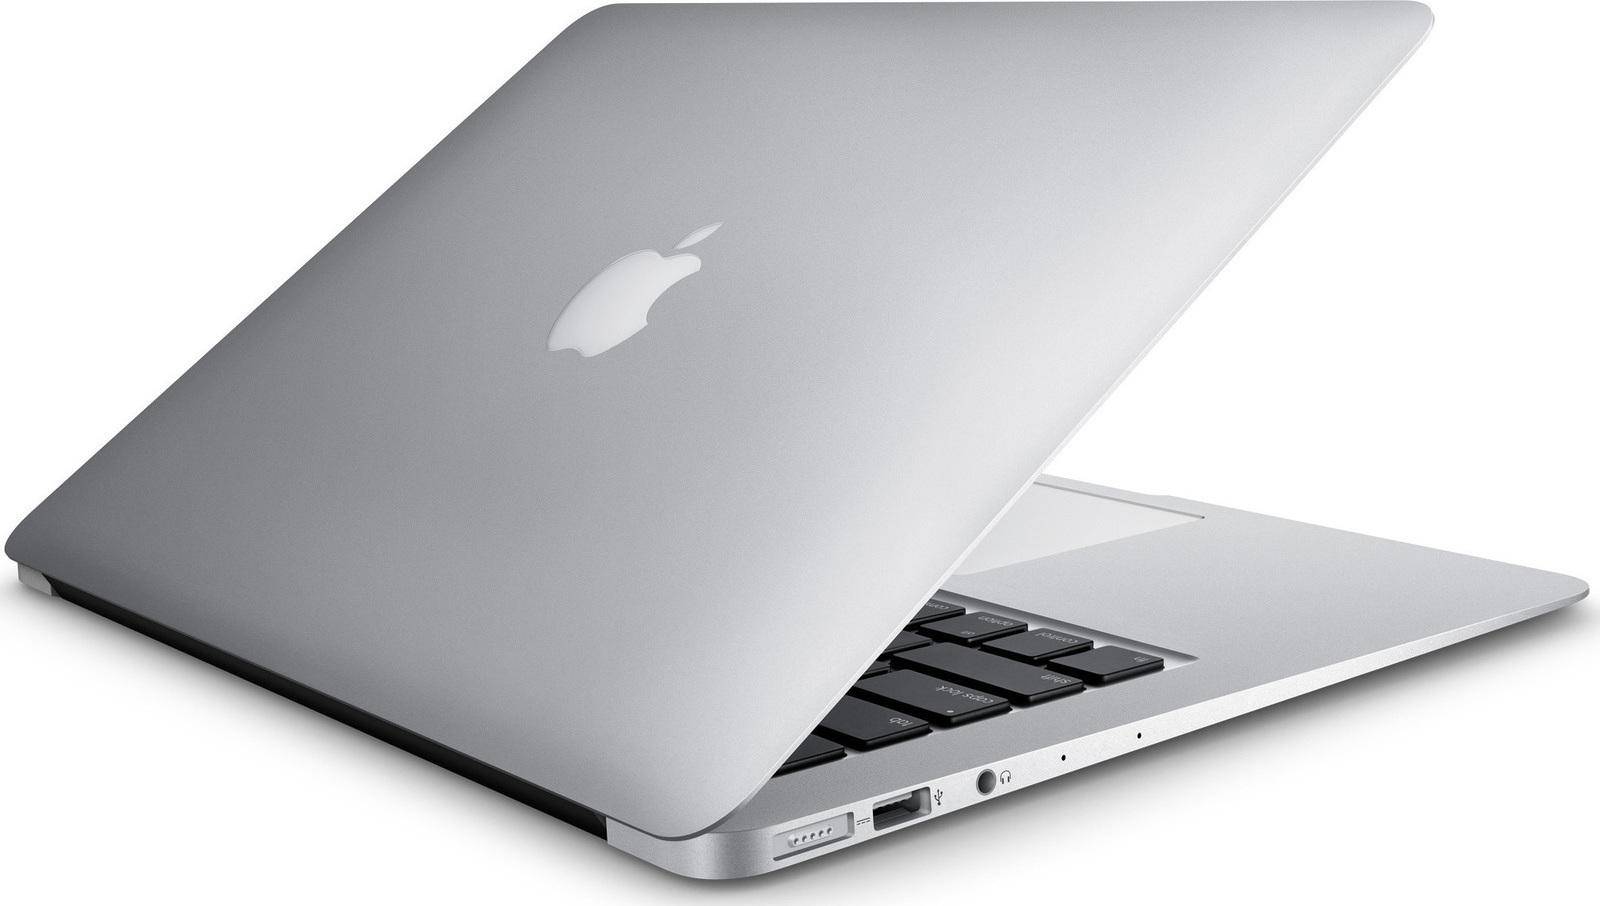 apple macbook air 13 1 6ghz i5 8gb 128gb flash storage. Black Bedroom Furniture Sets. Home Design Ideas